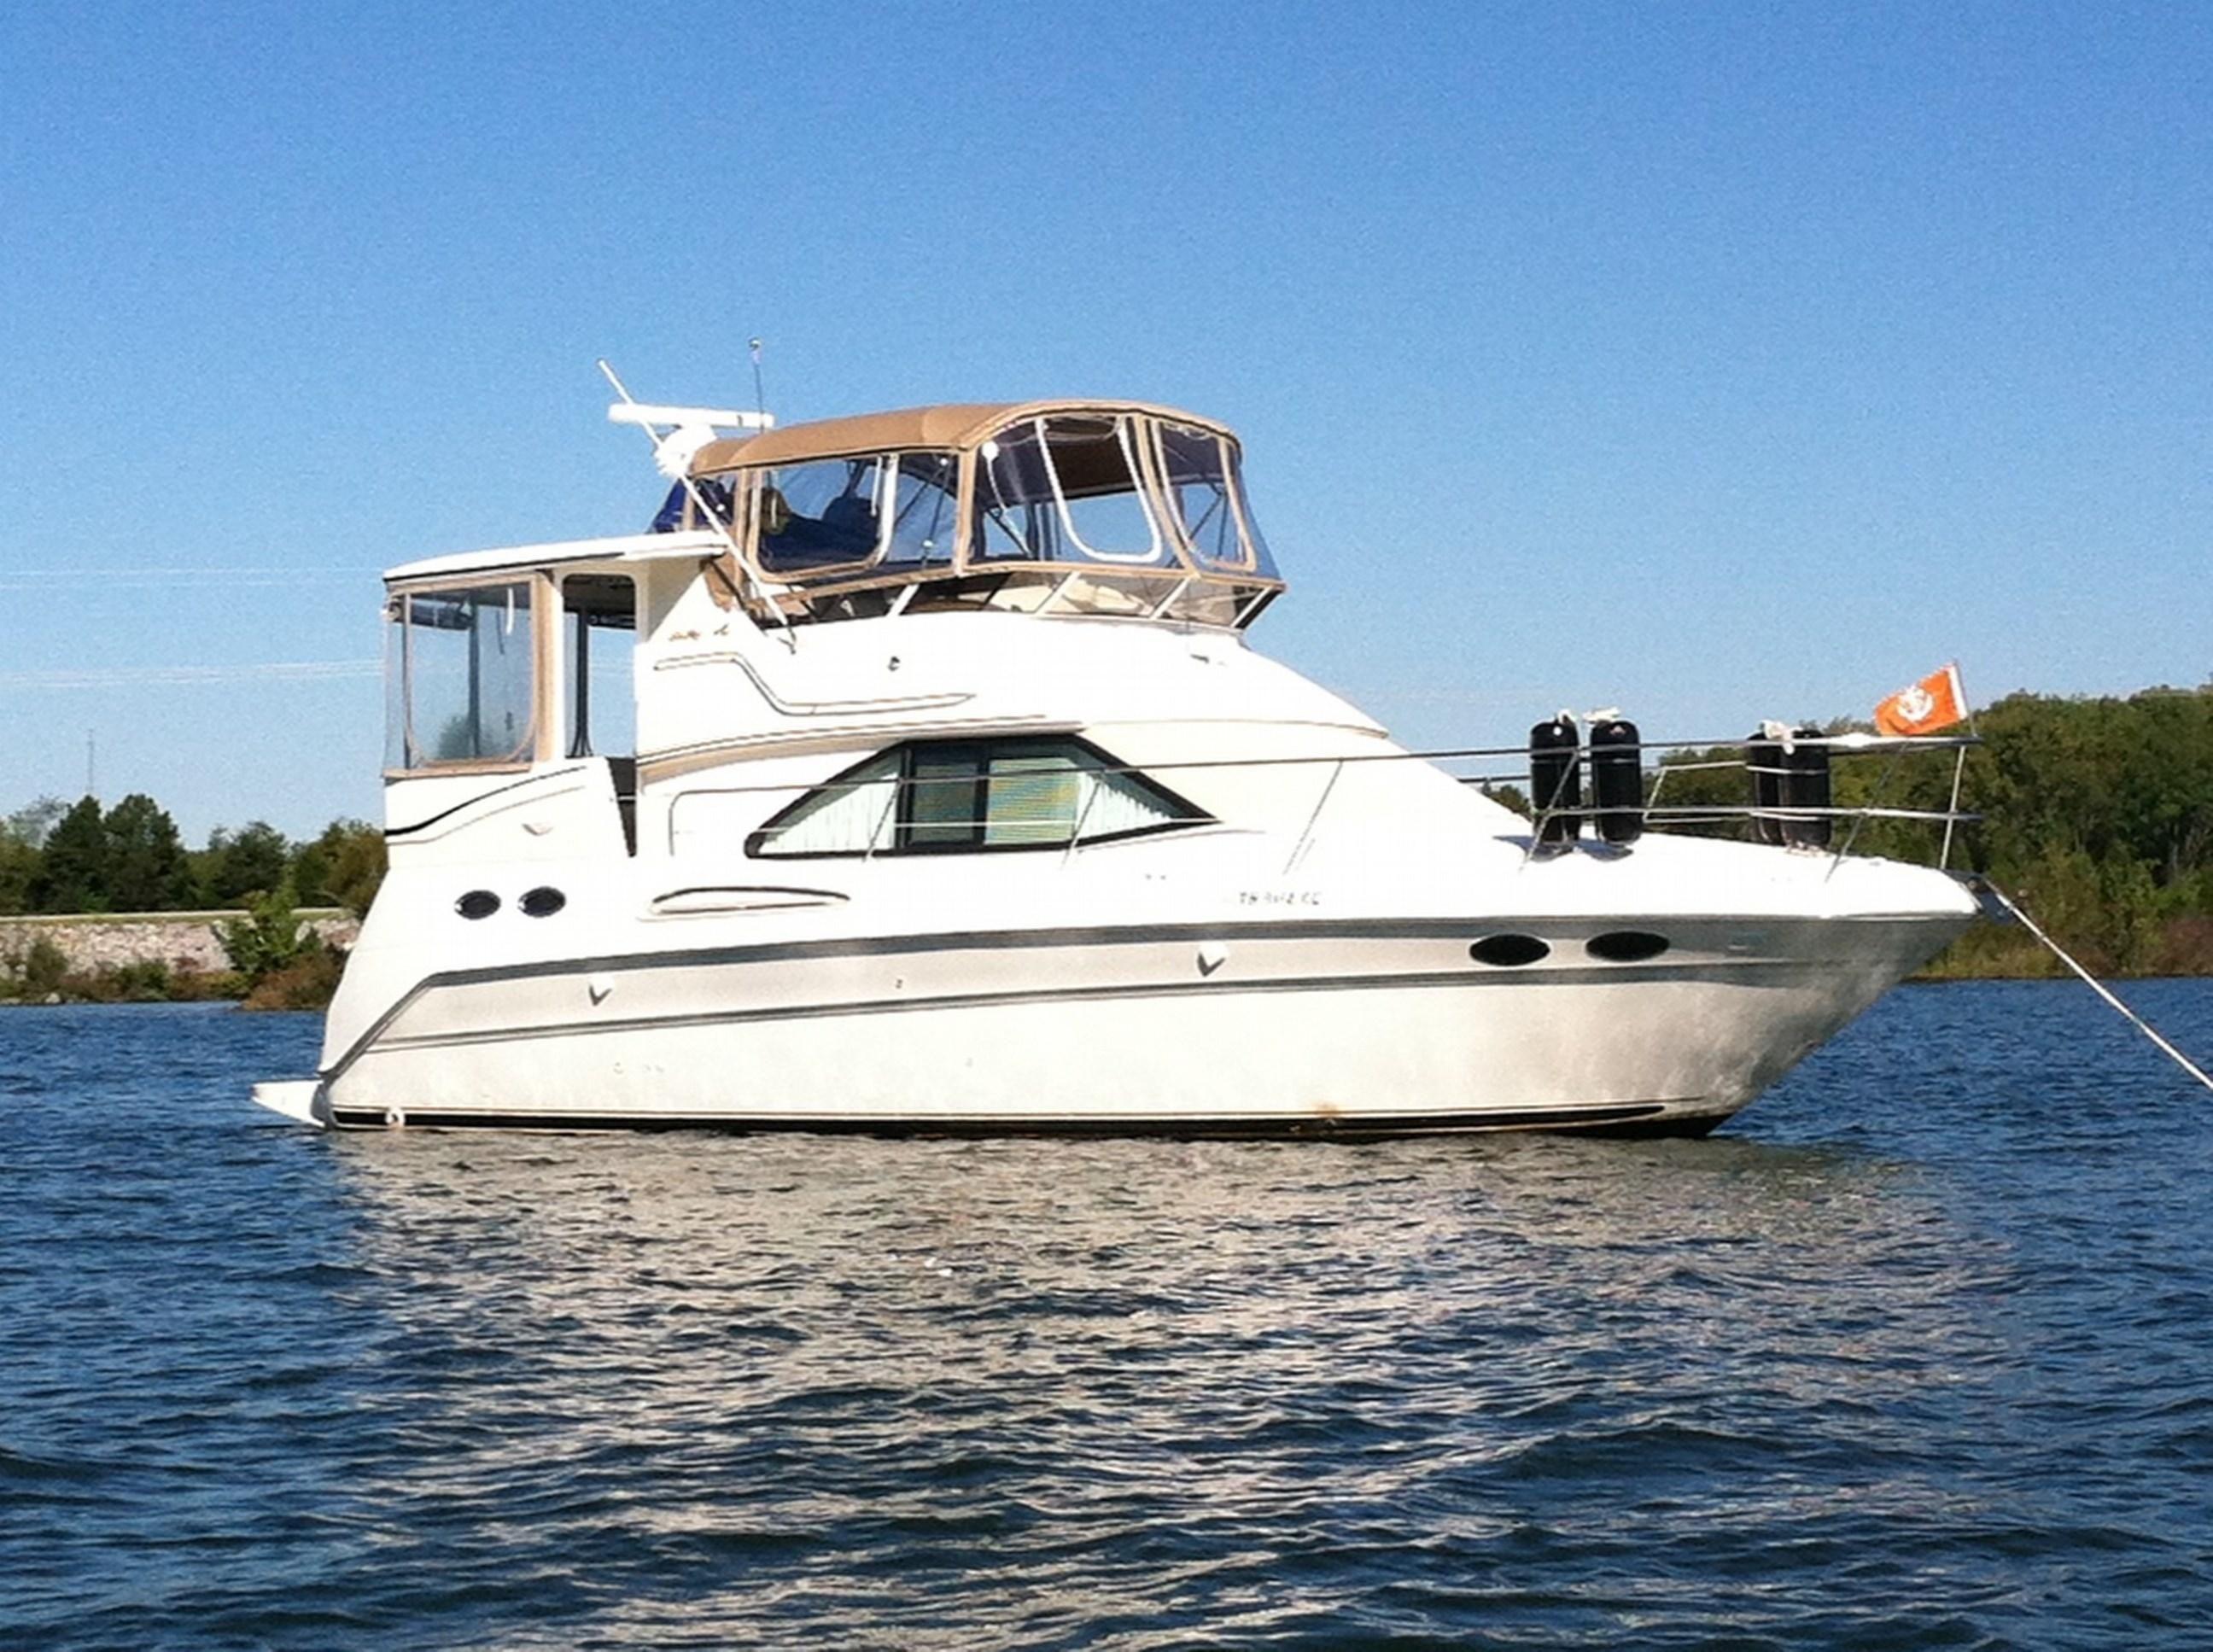 1999 Carver 356 Aft Cabin Motor Yacht Power Boat For Sale